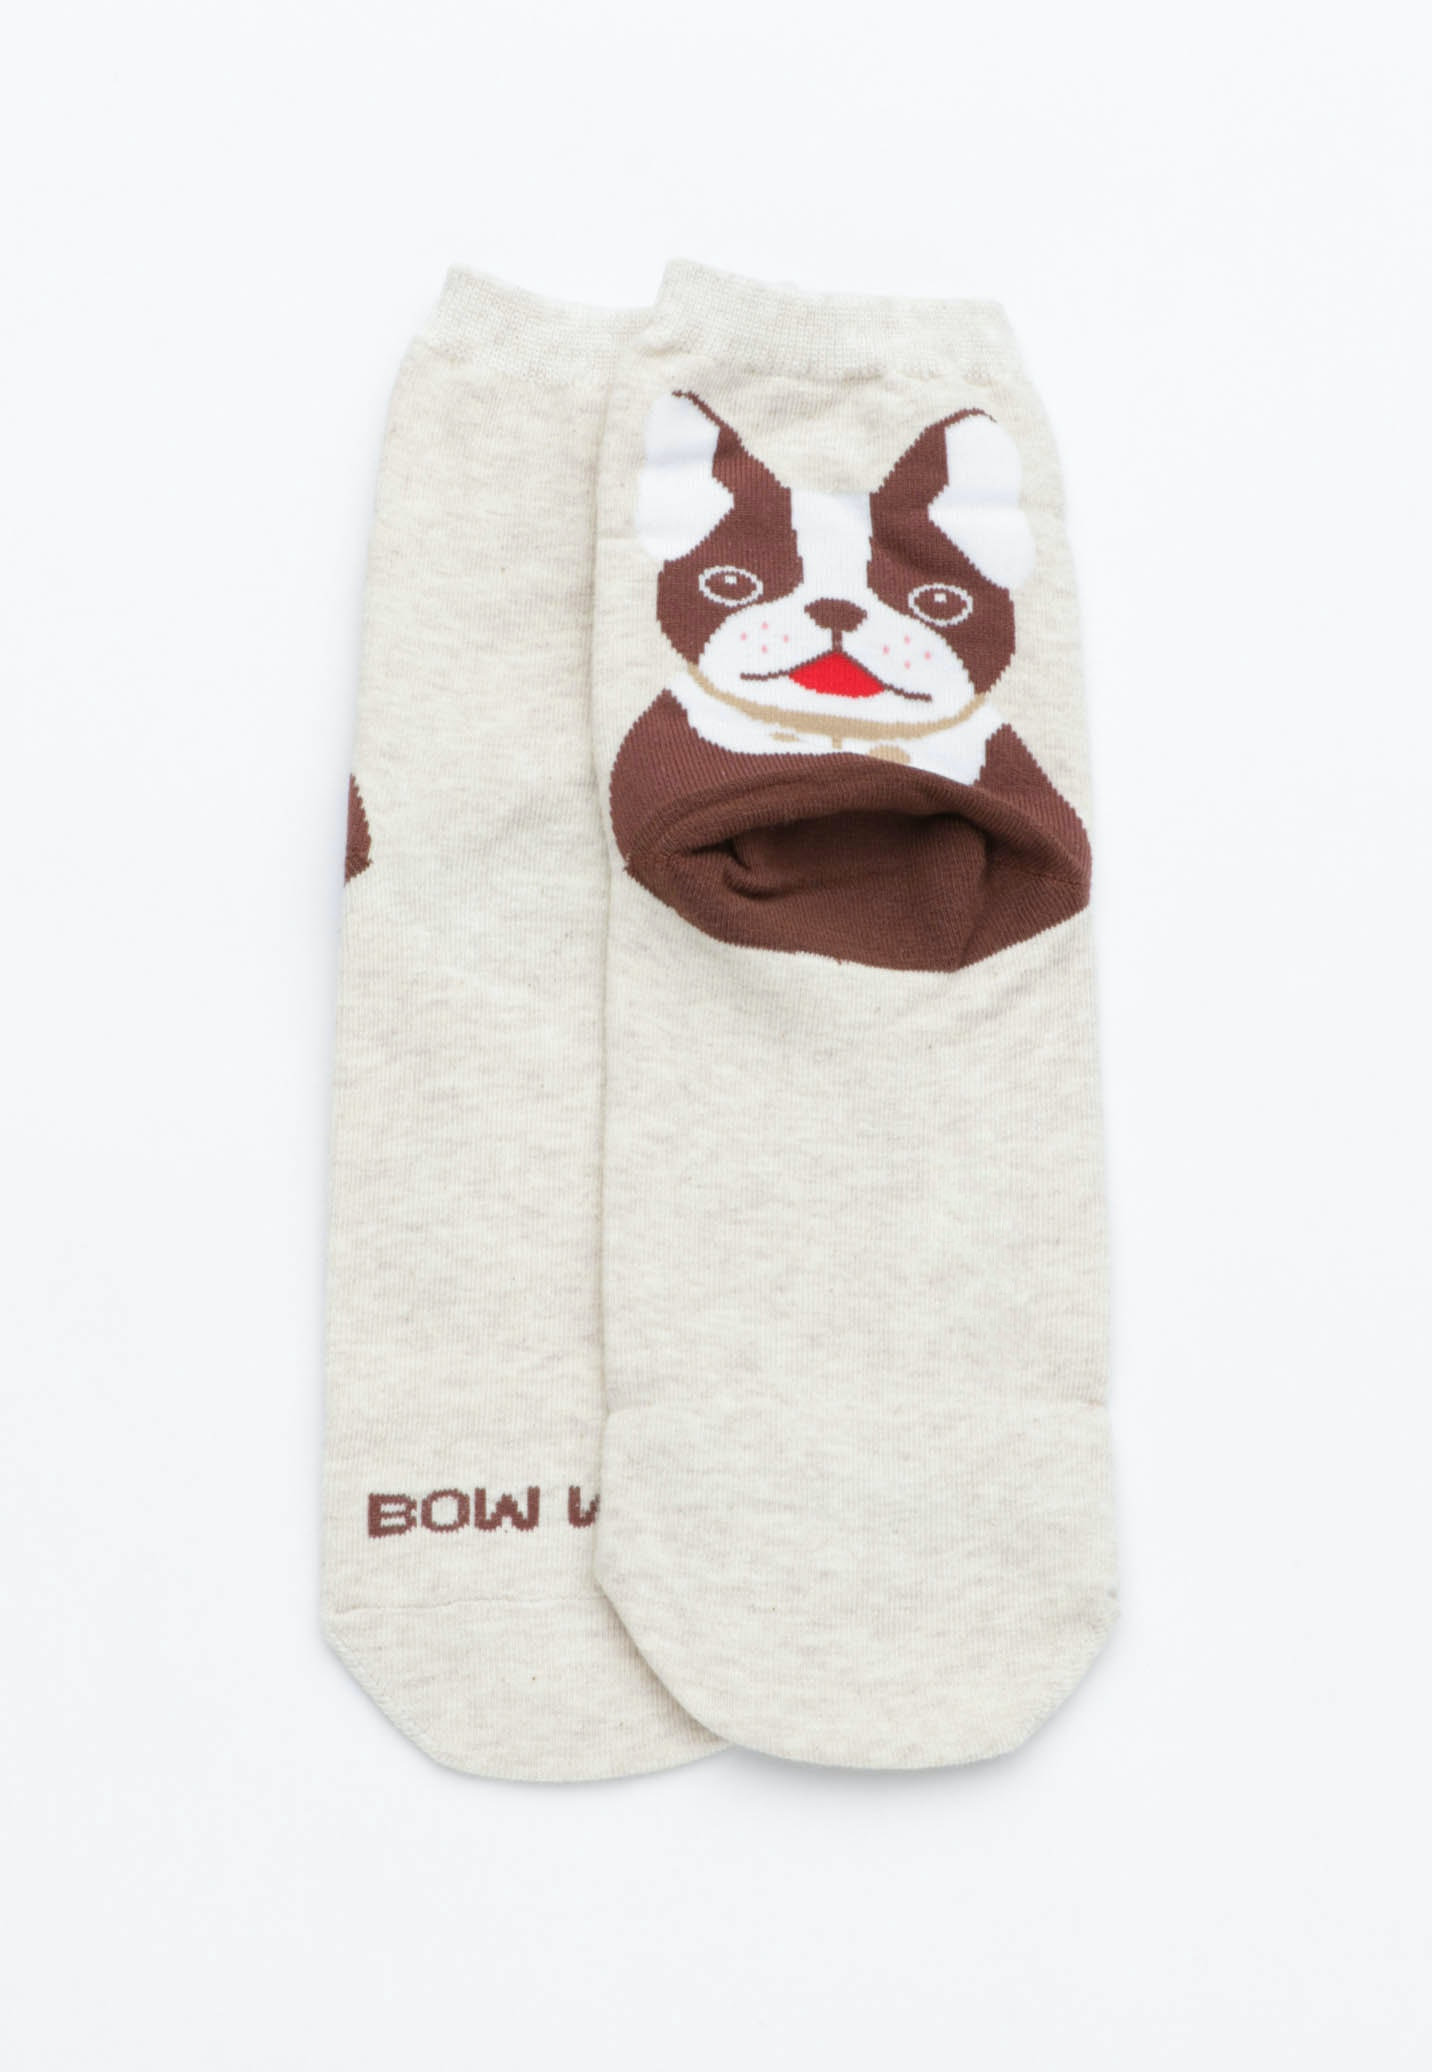 Bow Wow Socks - Oatmeal